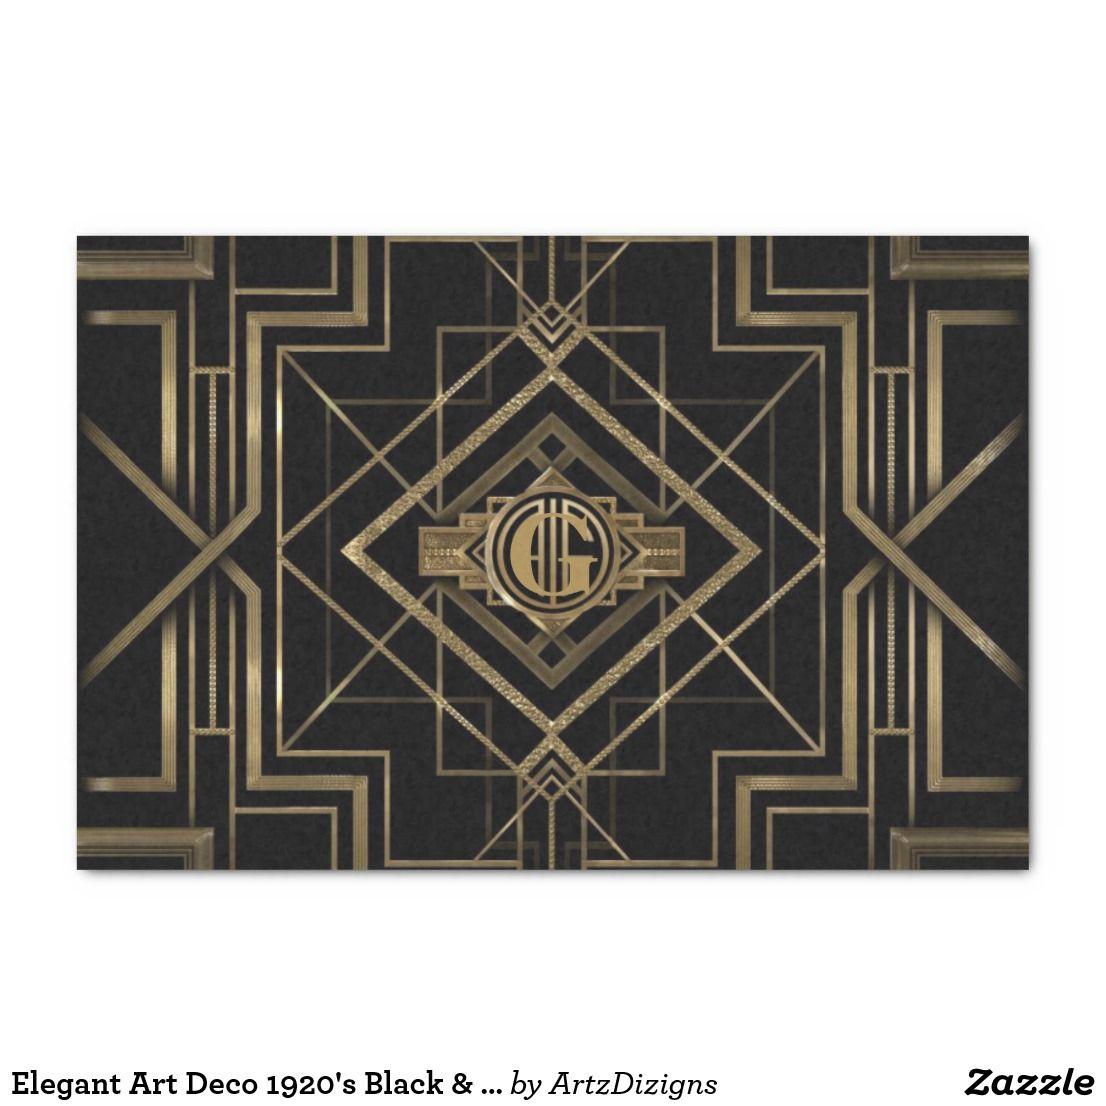 Elegant Art Deco 1920s Black & Gold Tissue Paper | Zazzle.com